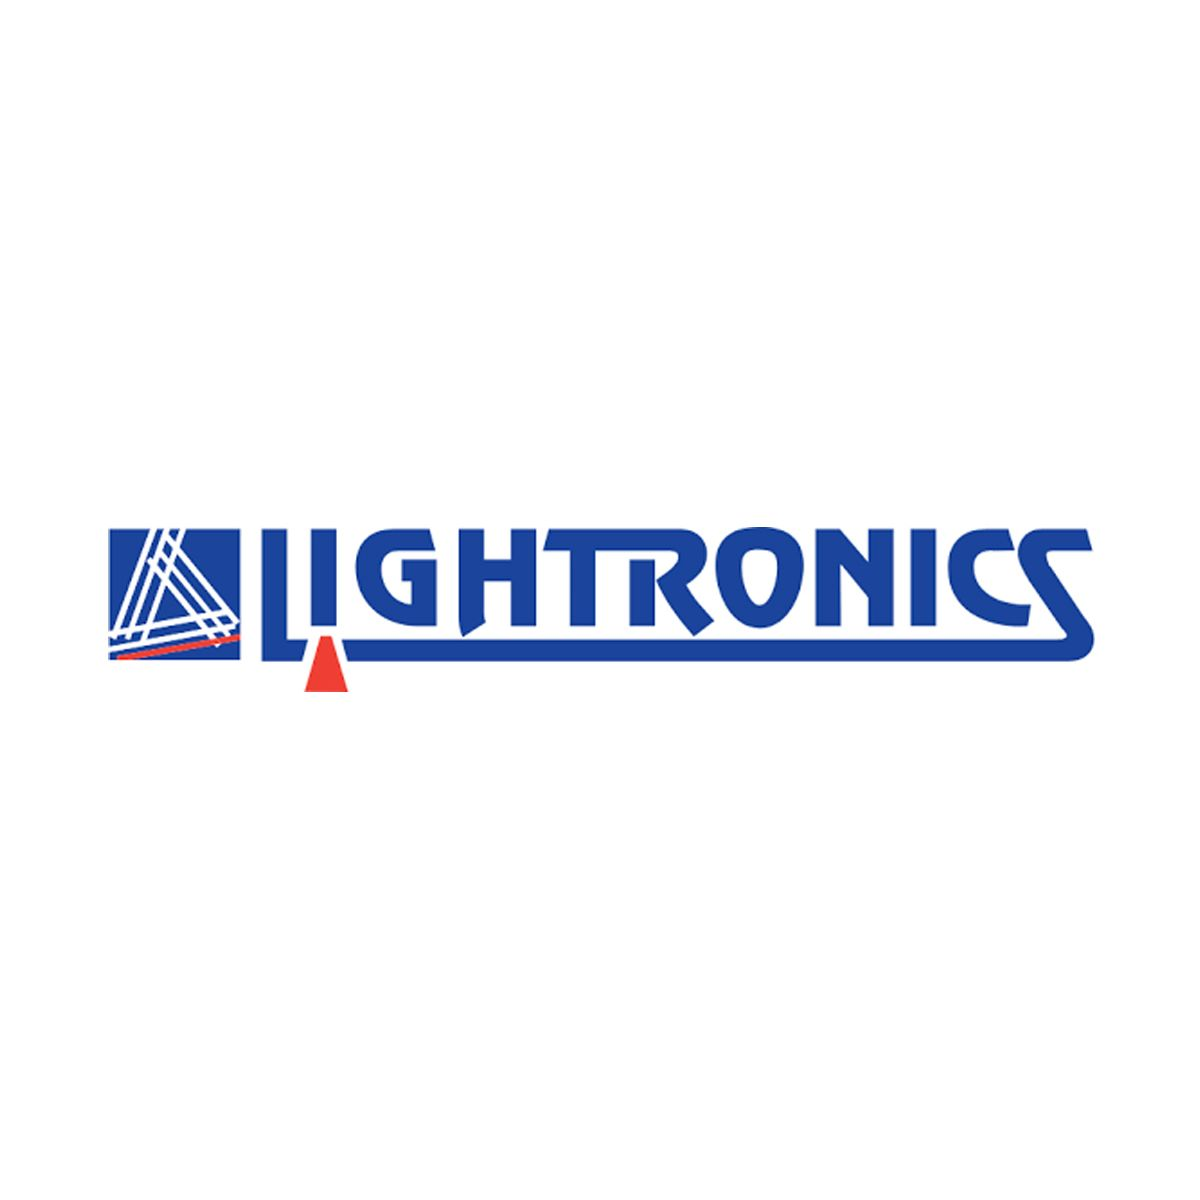 Logo: Lightronics